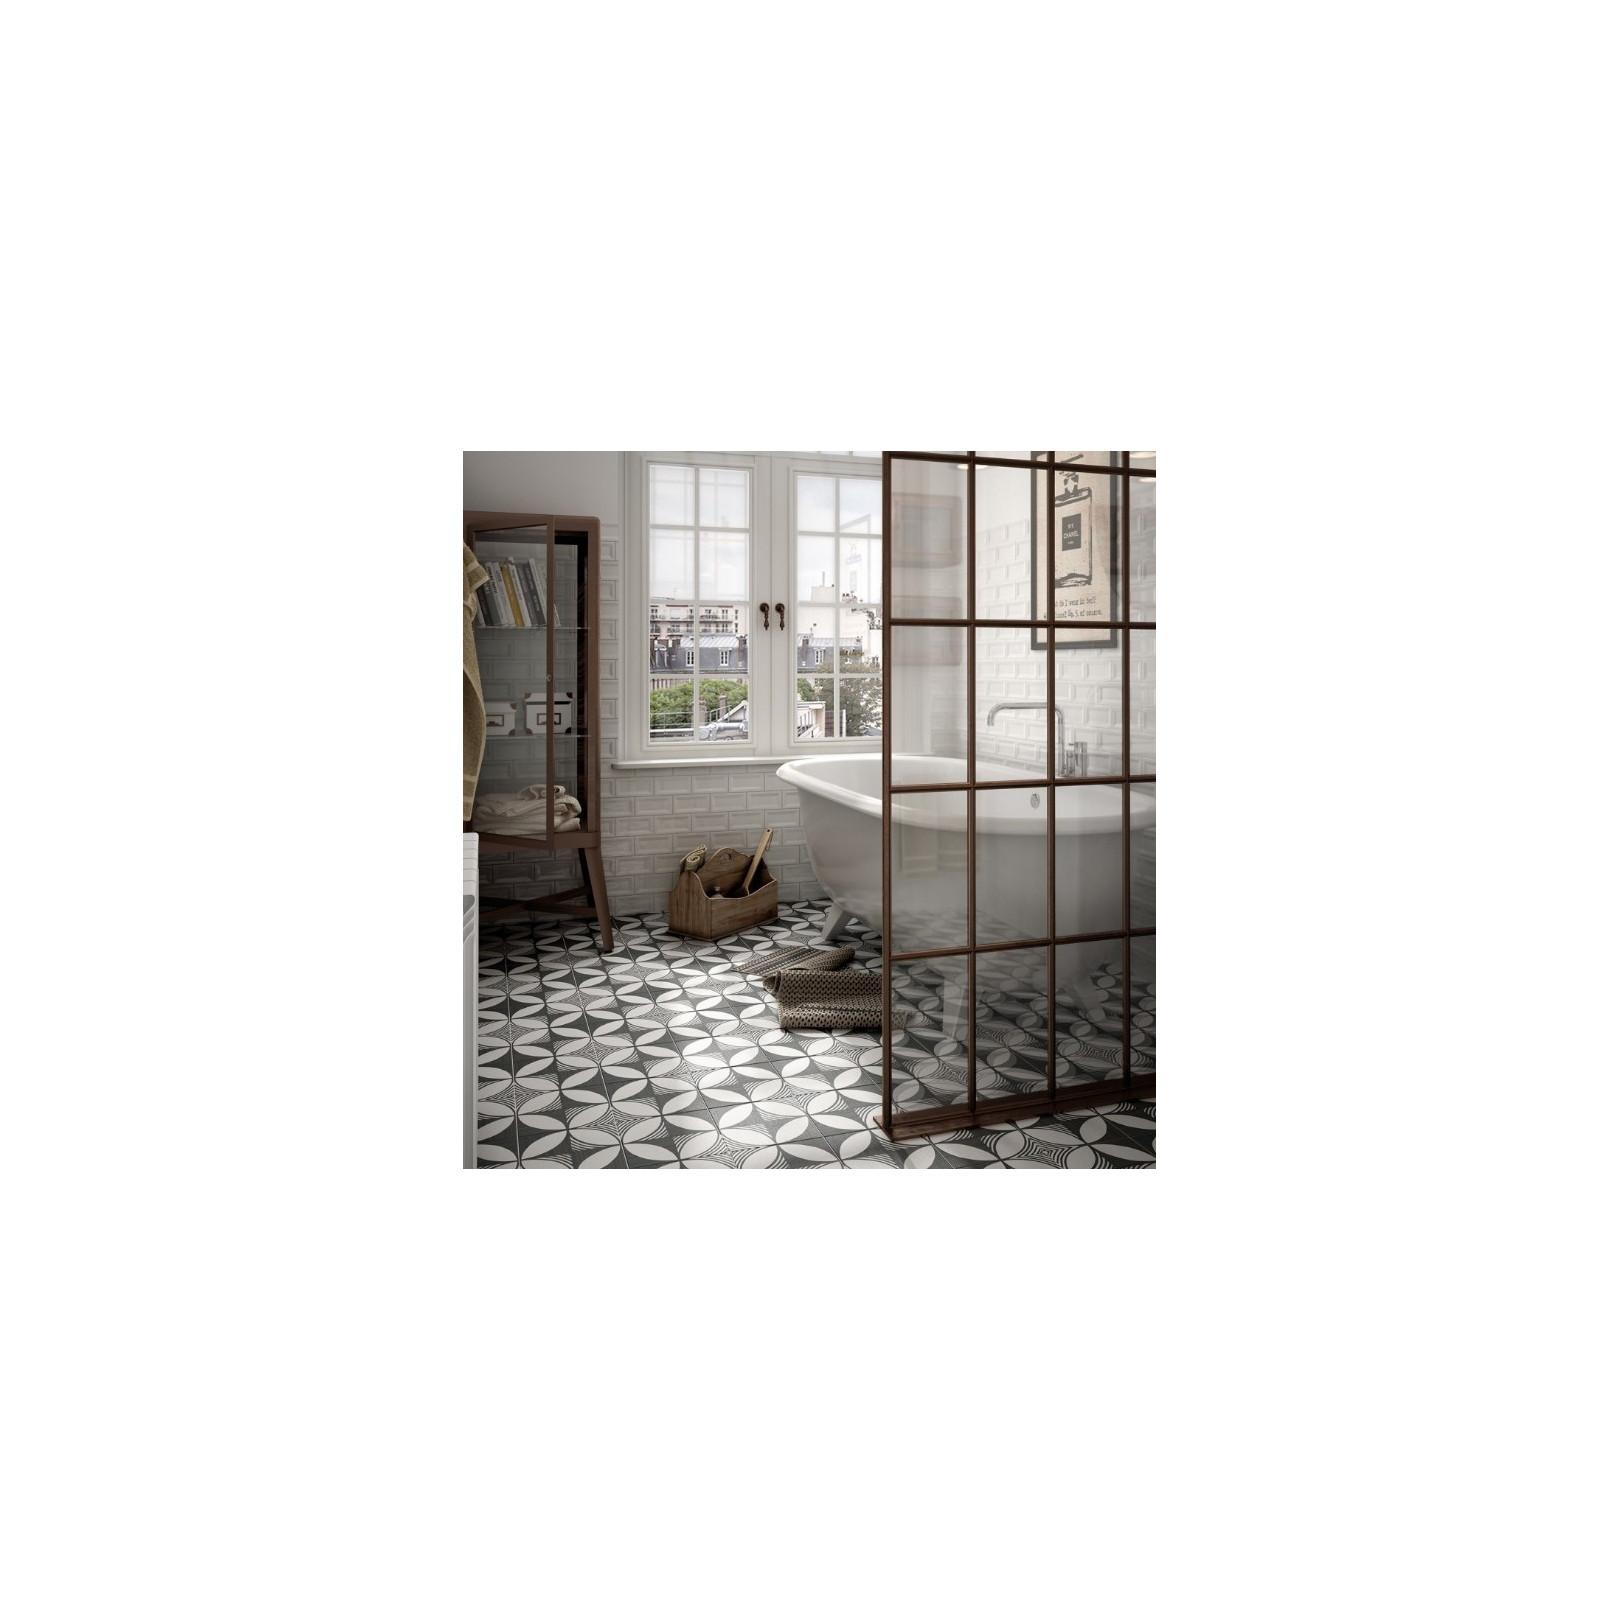 carrelage gr s c rame effet carreau ciment caprice deco b w compass casalux home design. Black Bedroom Furniture Sets. Home Design Ideas